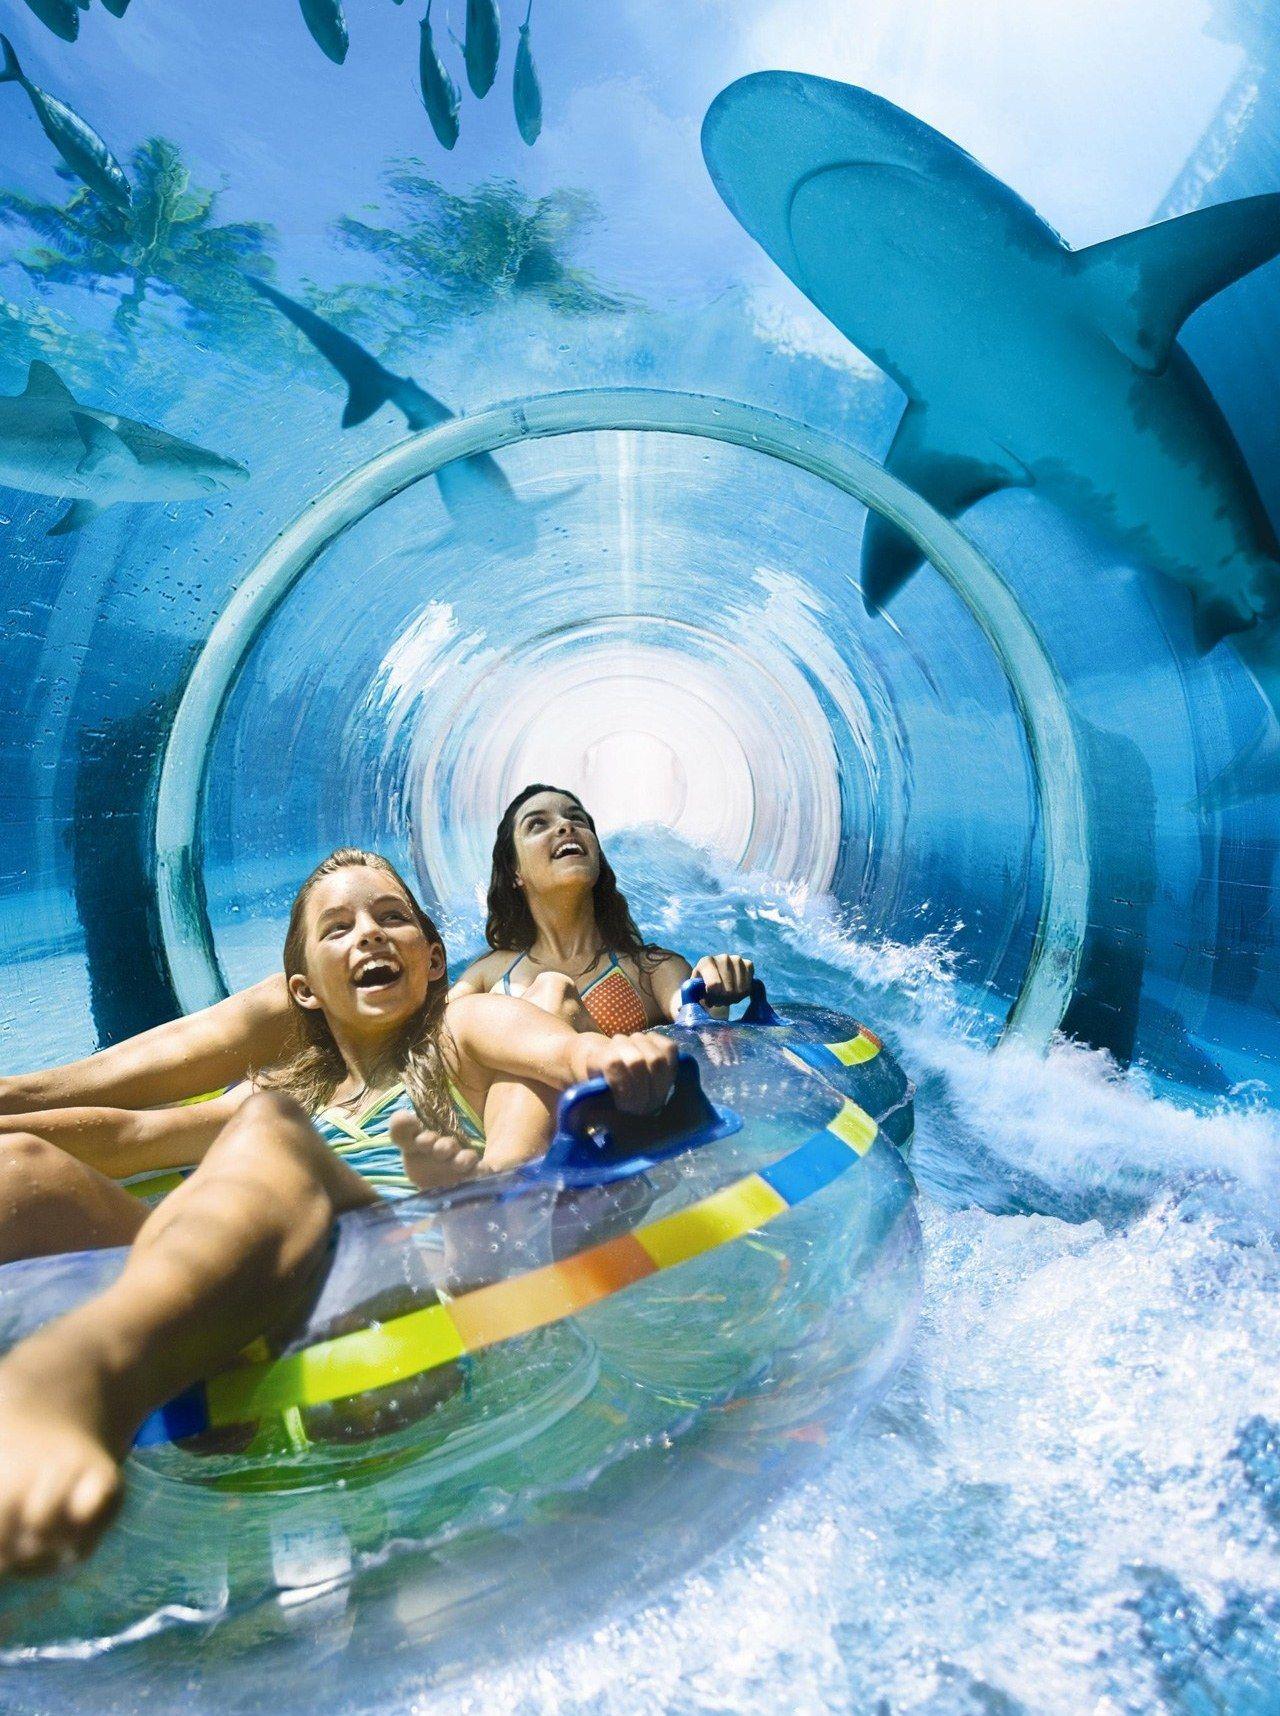 Shark Tunnel At The Wild Wadi Water Park Dubai Things